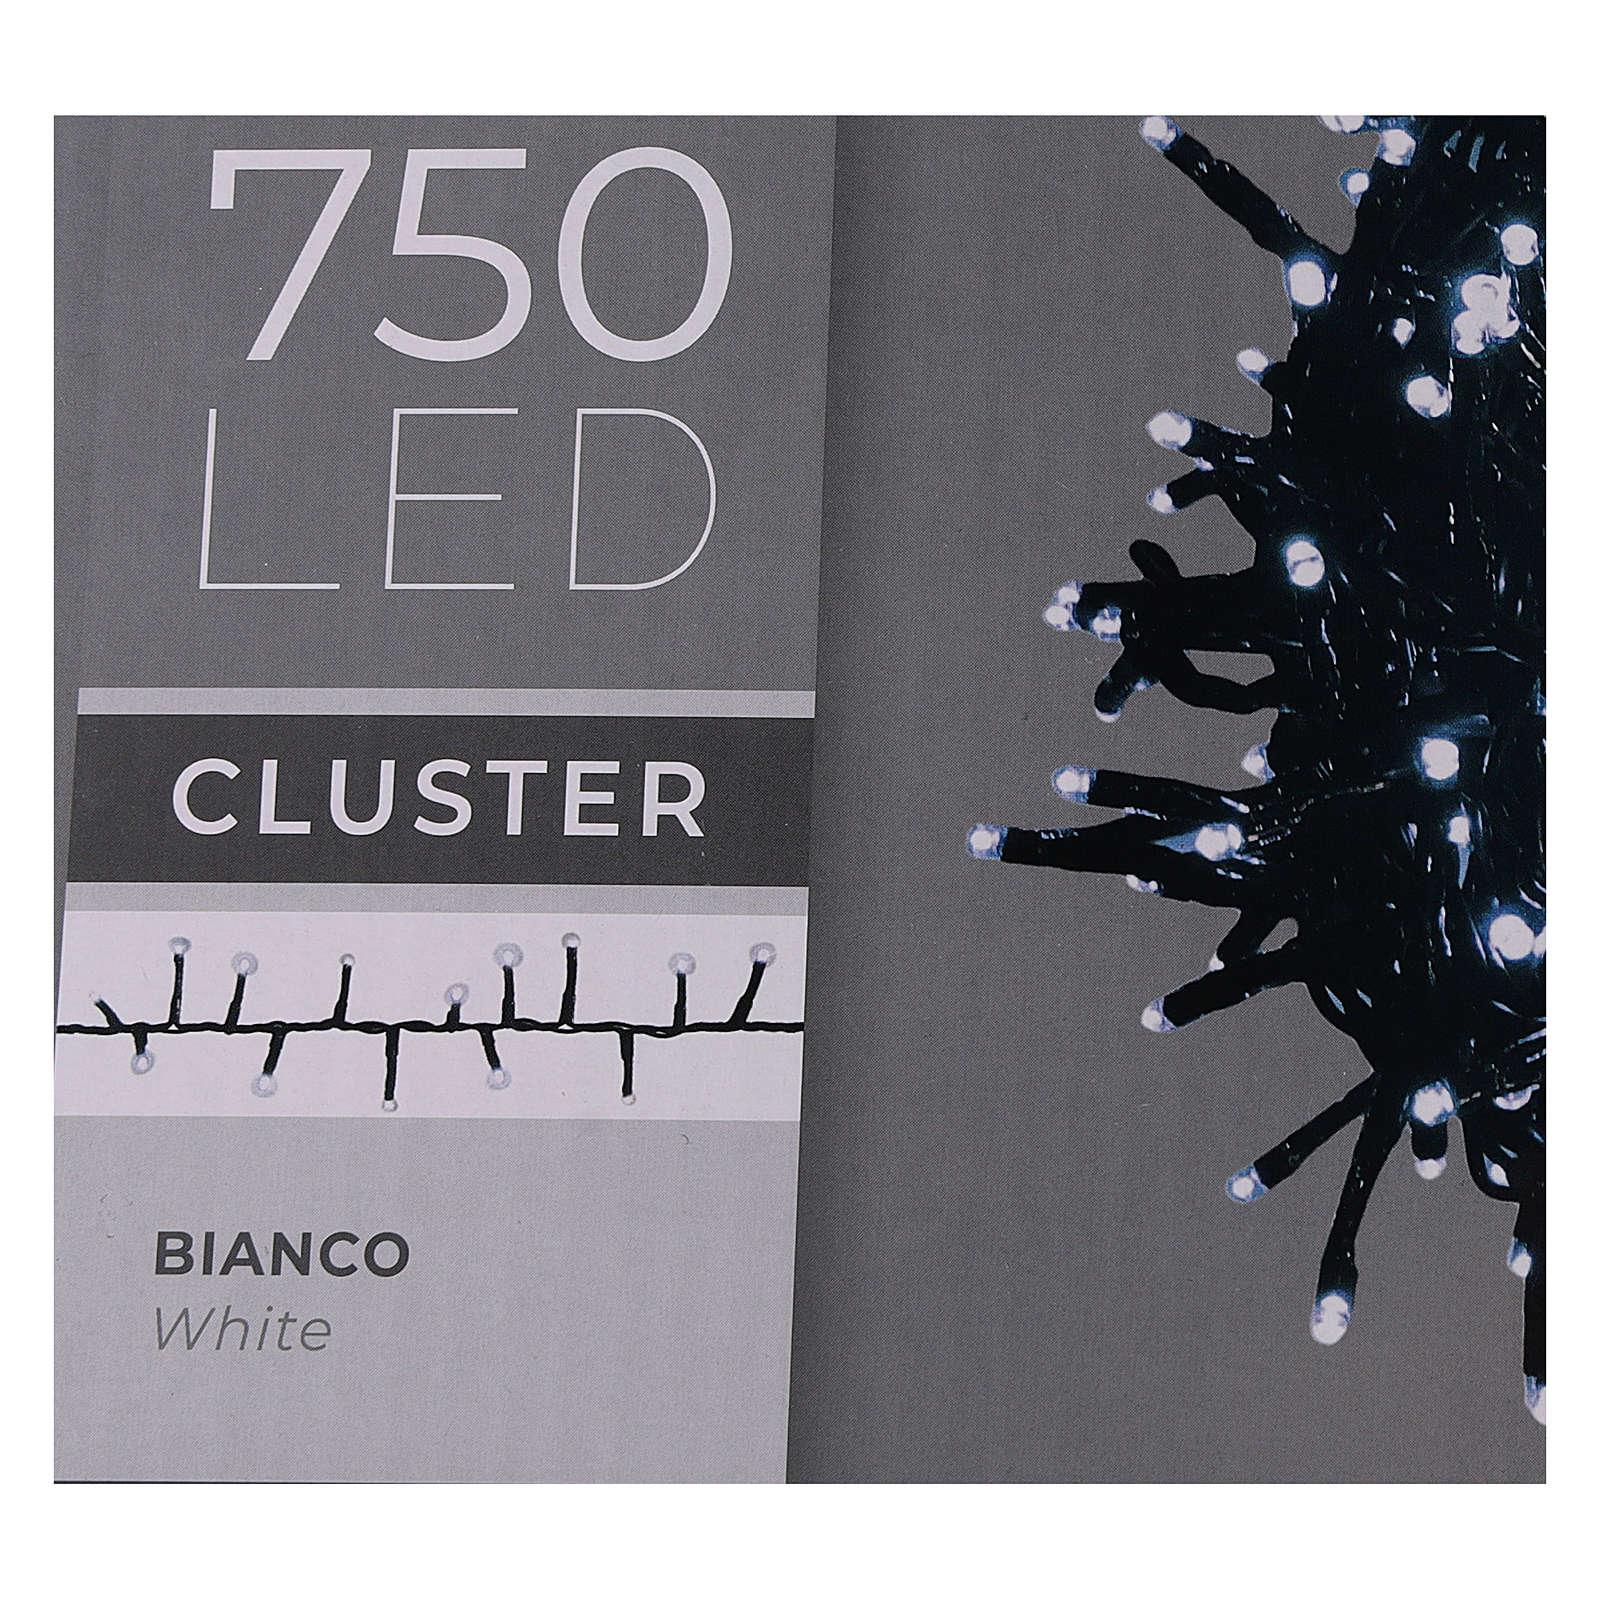 Catena luce Natale verde 750 led bianco freddo 220V esterno controller 3